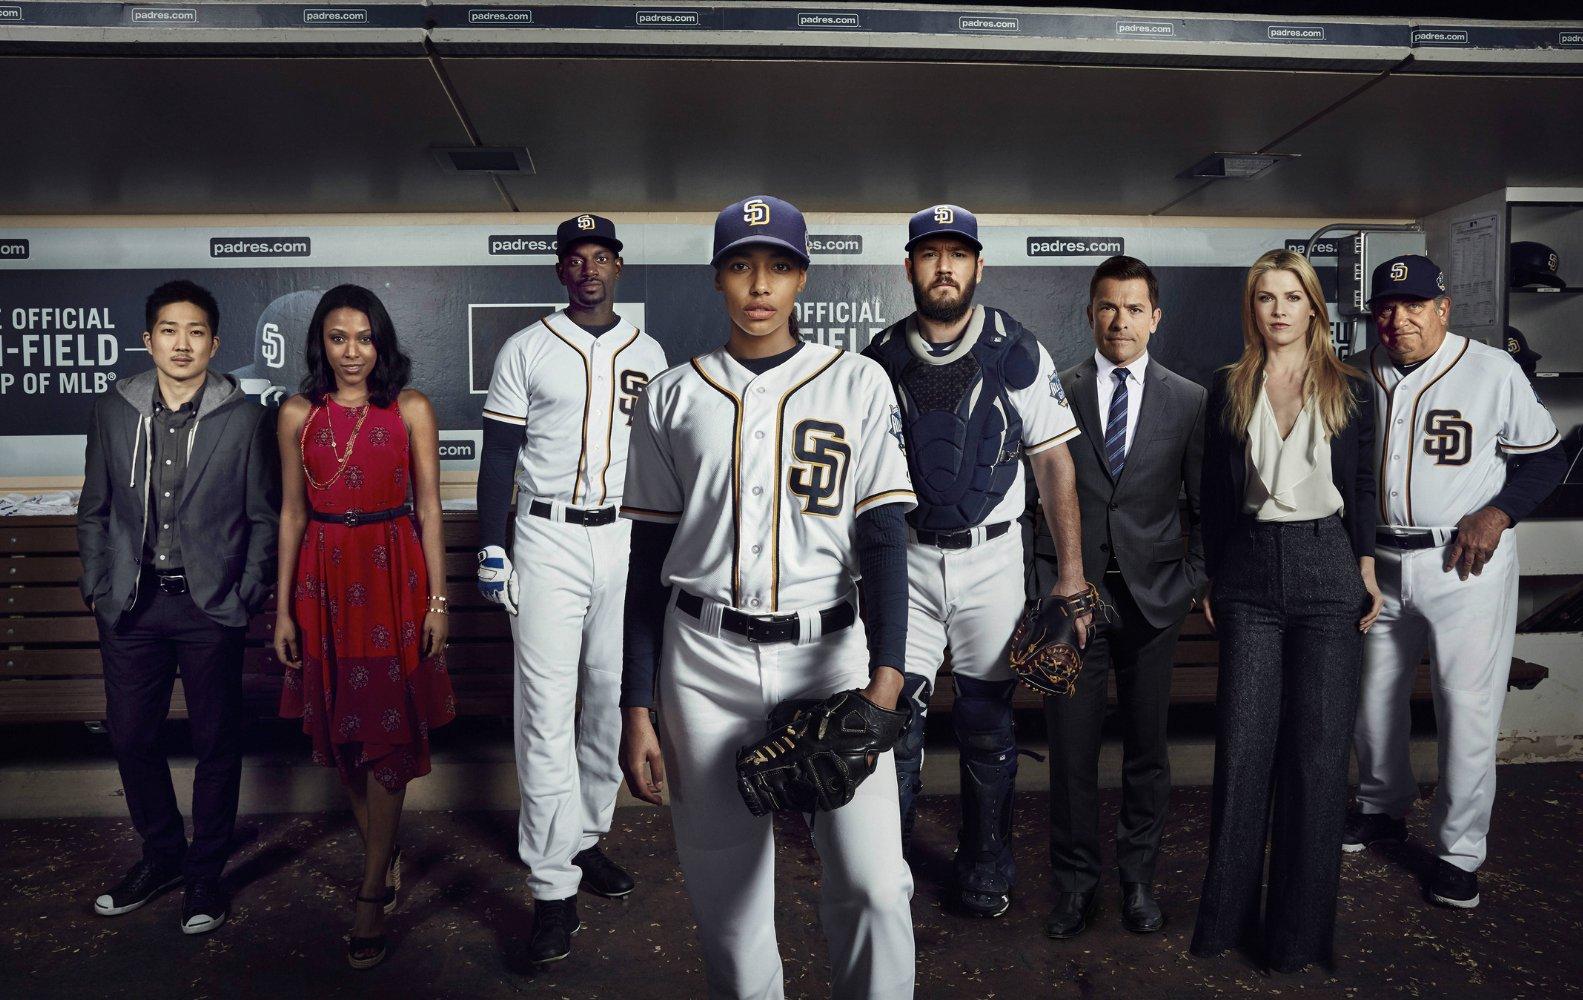 équipe, baseball, pitch